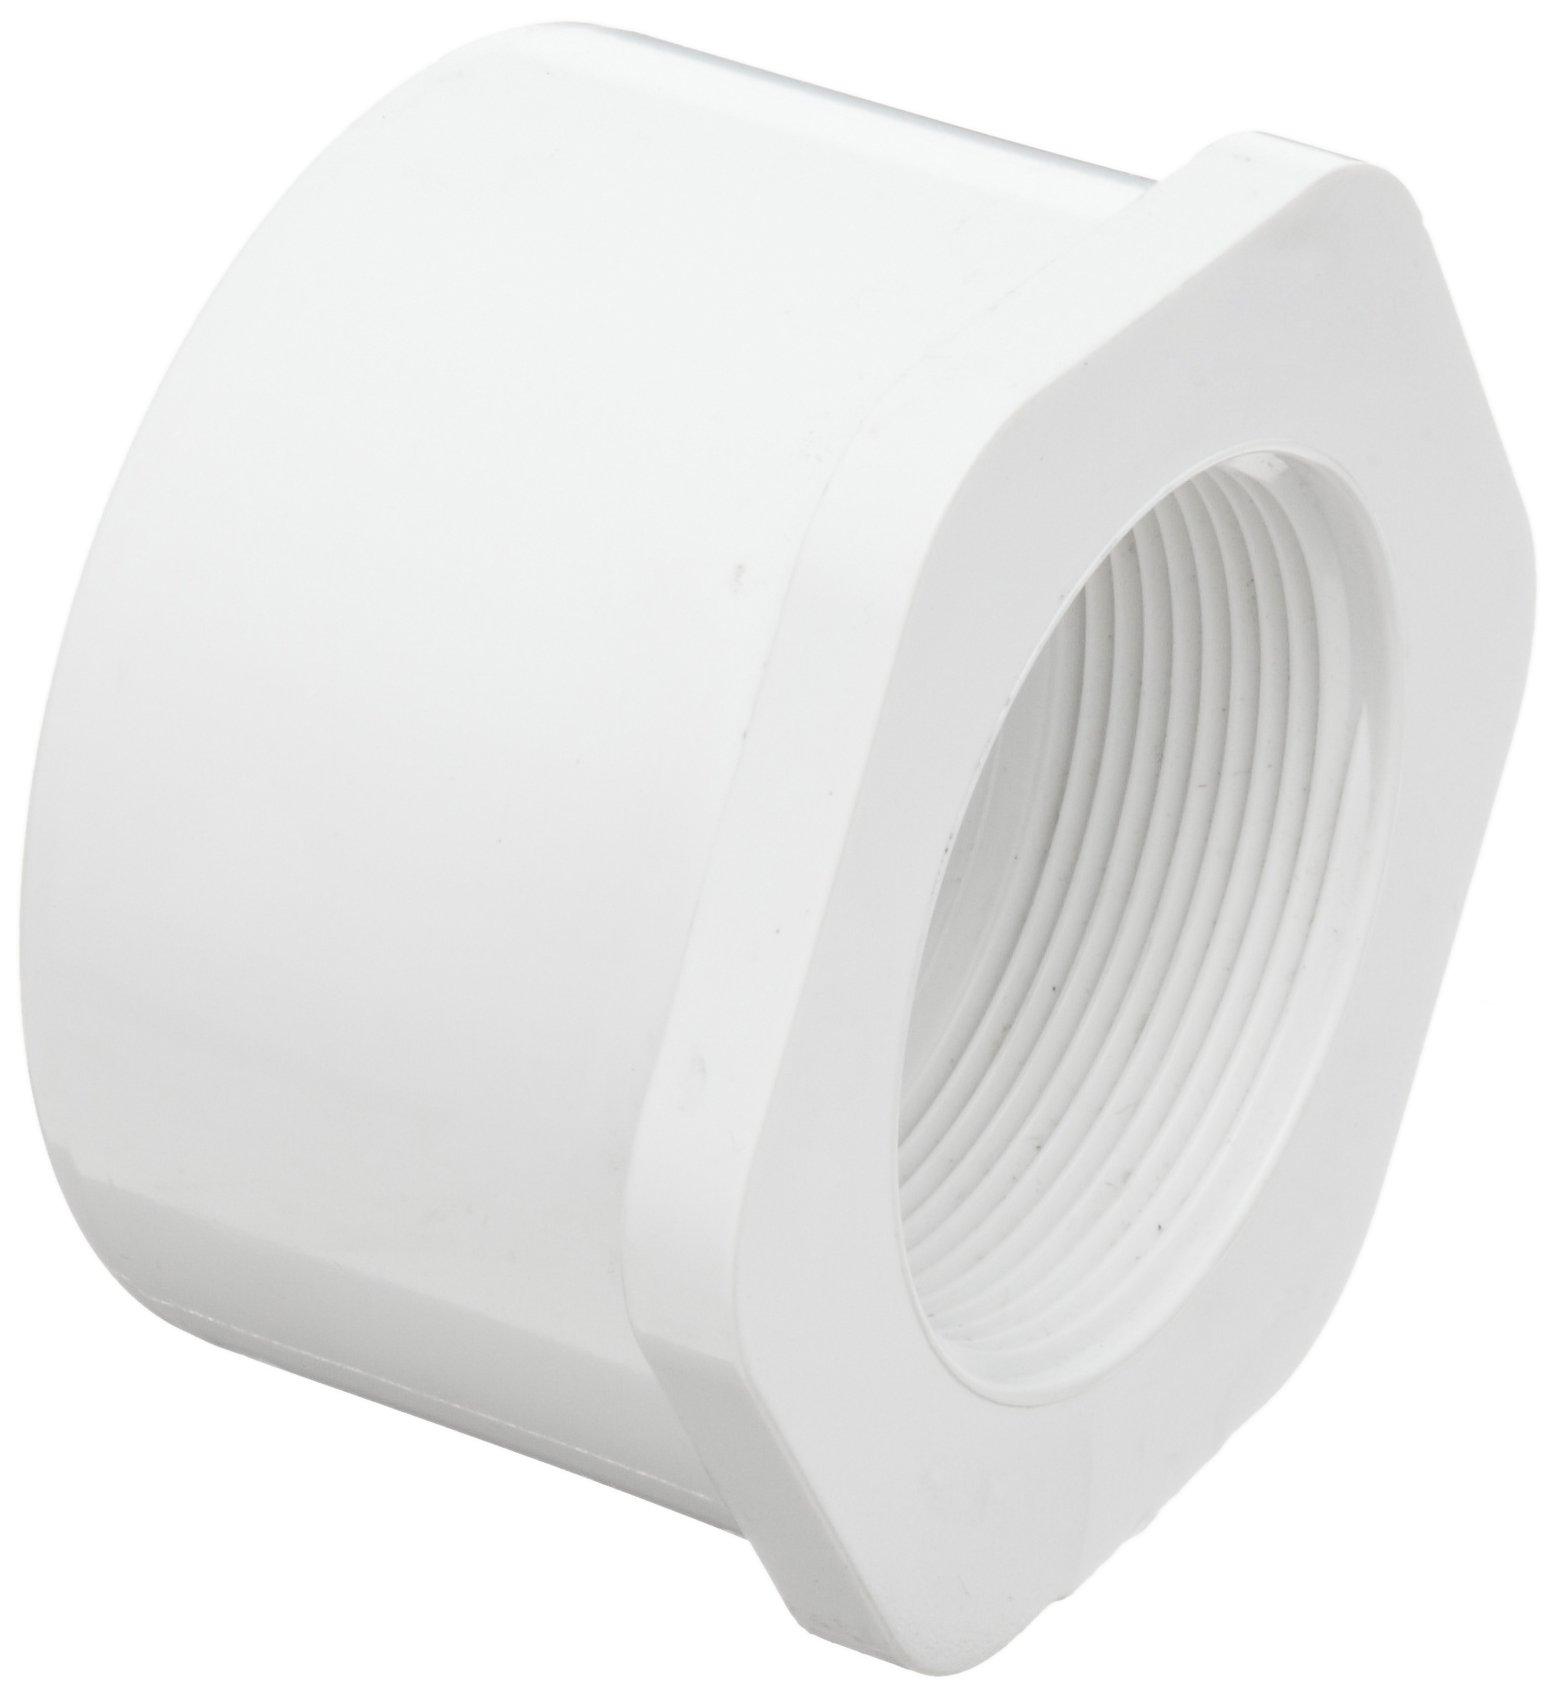 Flowline LM52-2410 PVC Reducer Bushing, 3'' Slip x 2'' NPT Thread